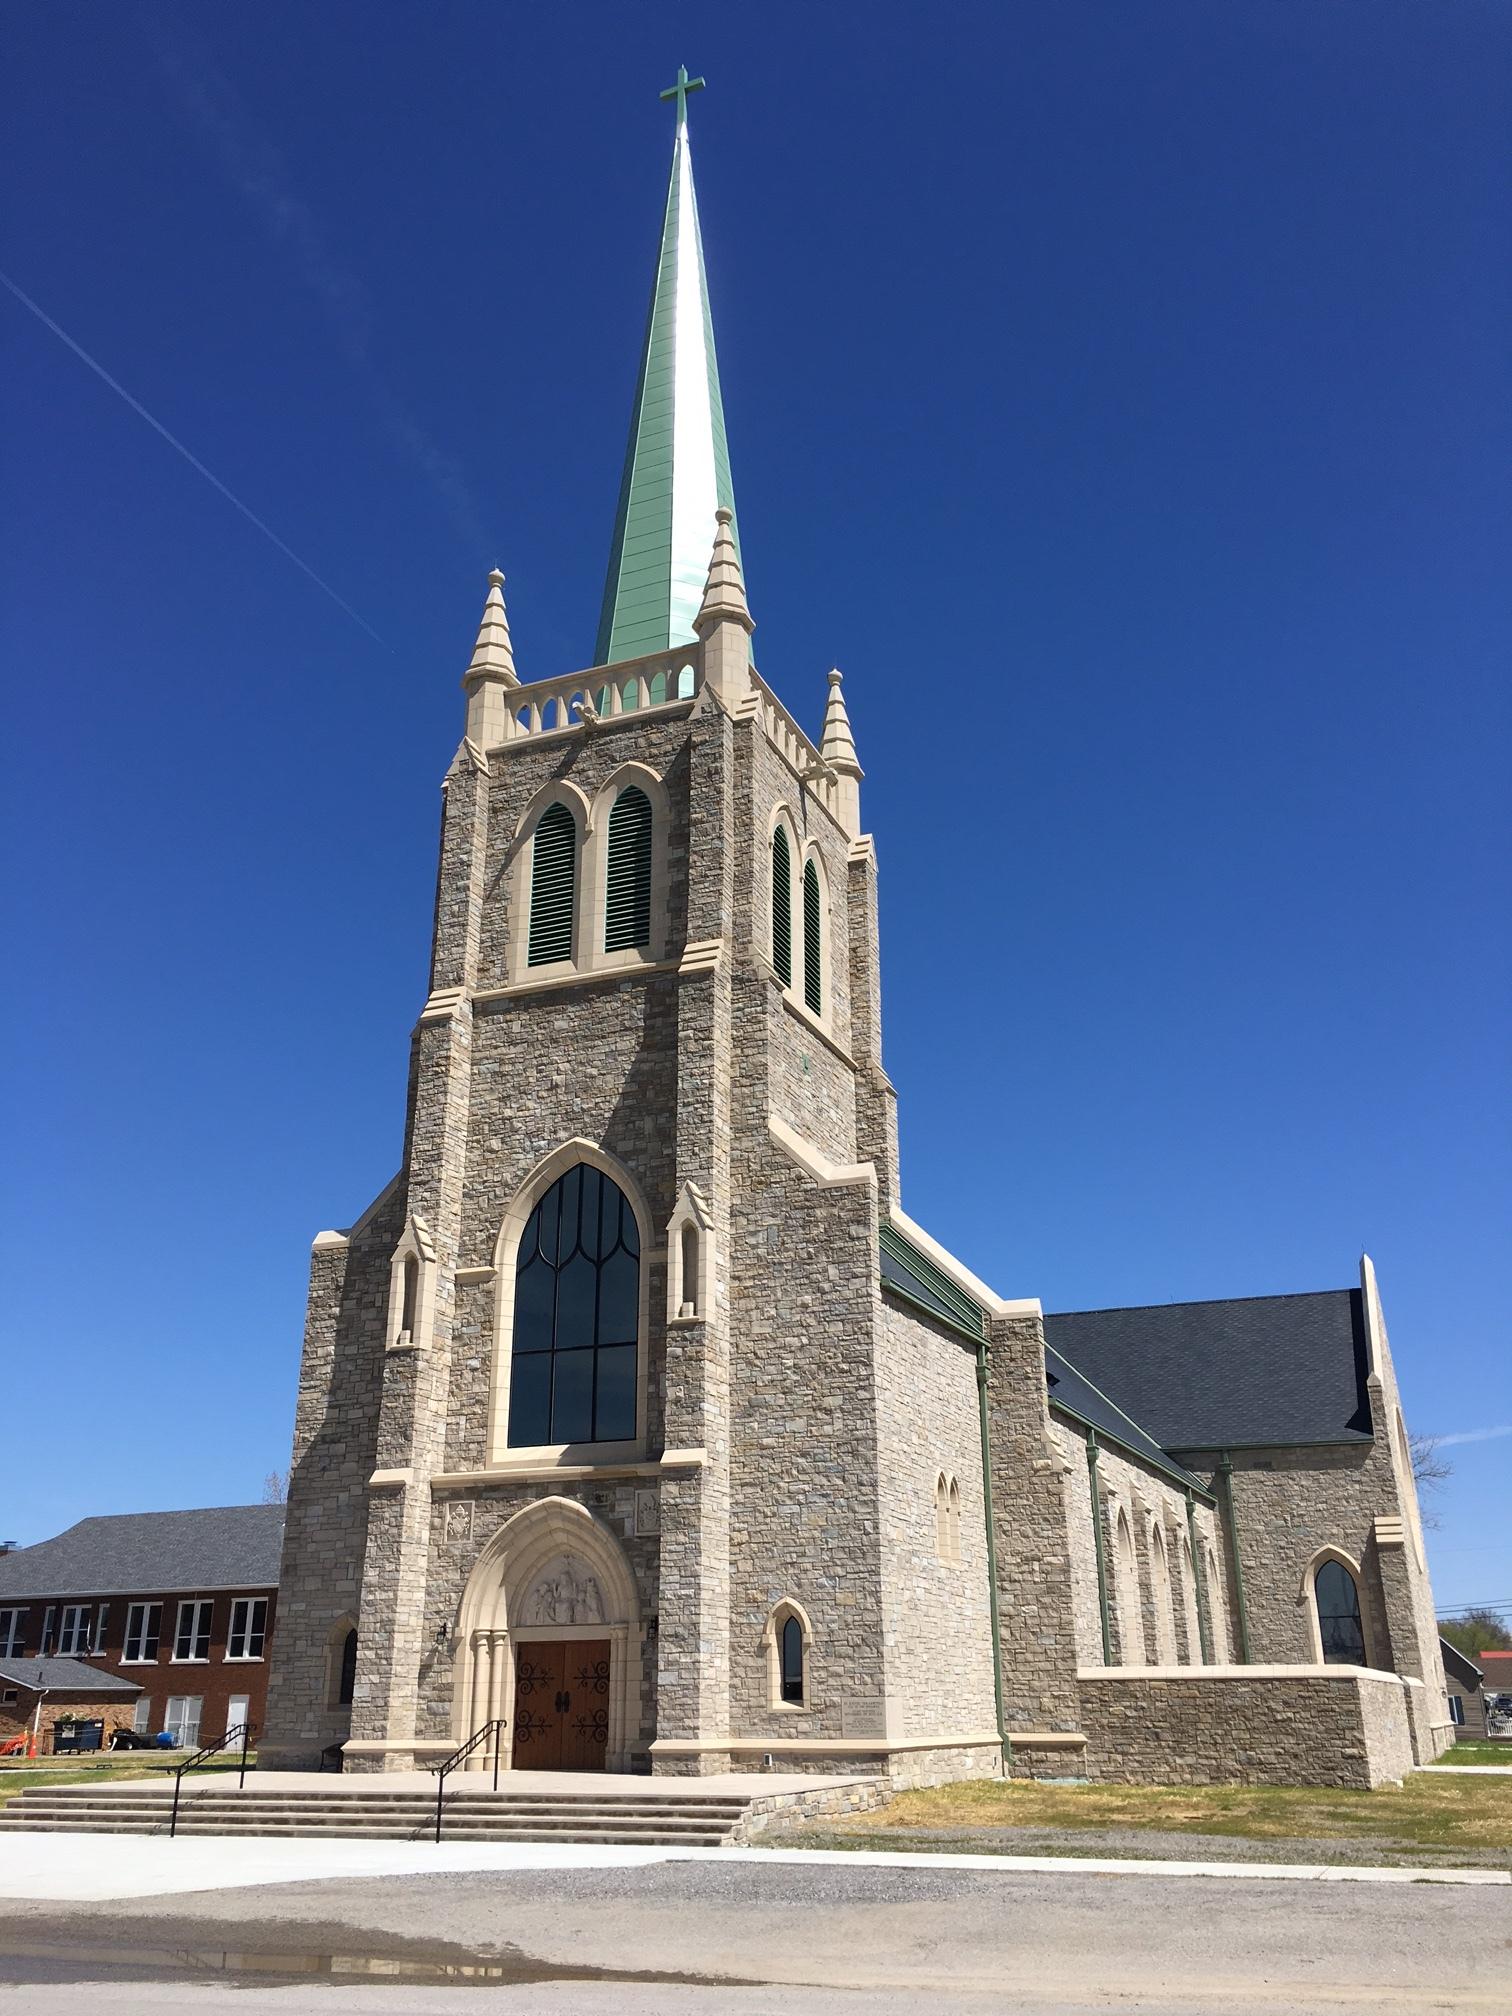 St. Kateri Tekakwitha: Ridgway, IL Completed December 2015